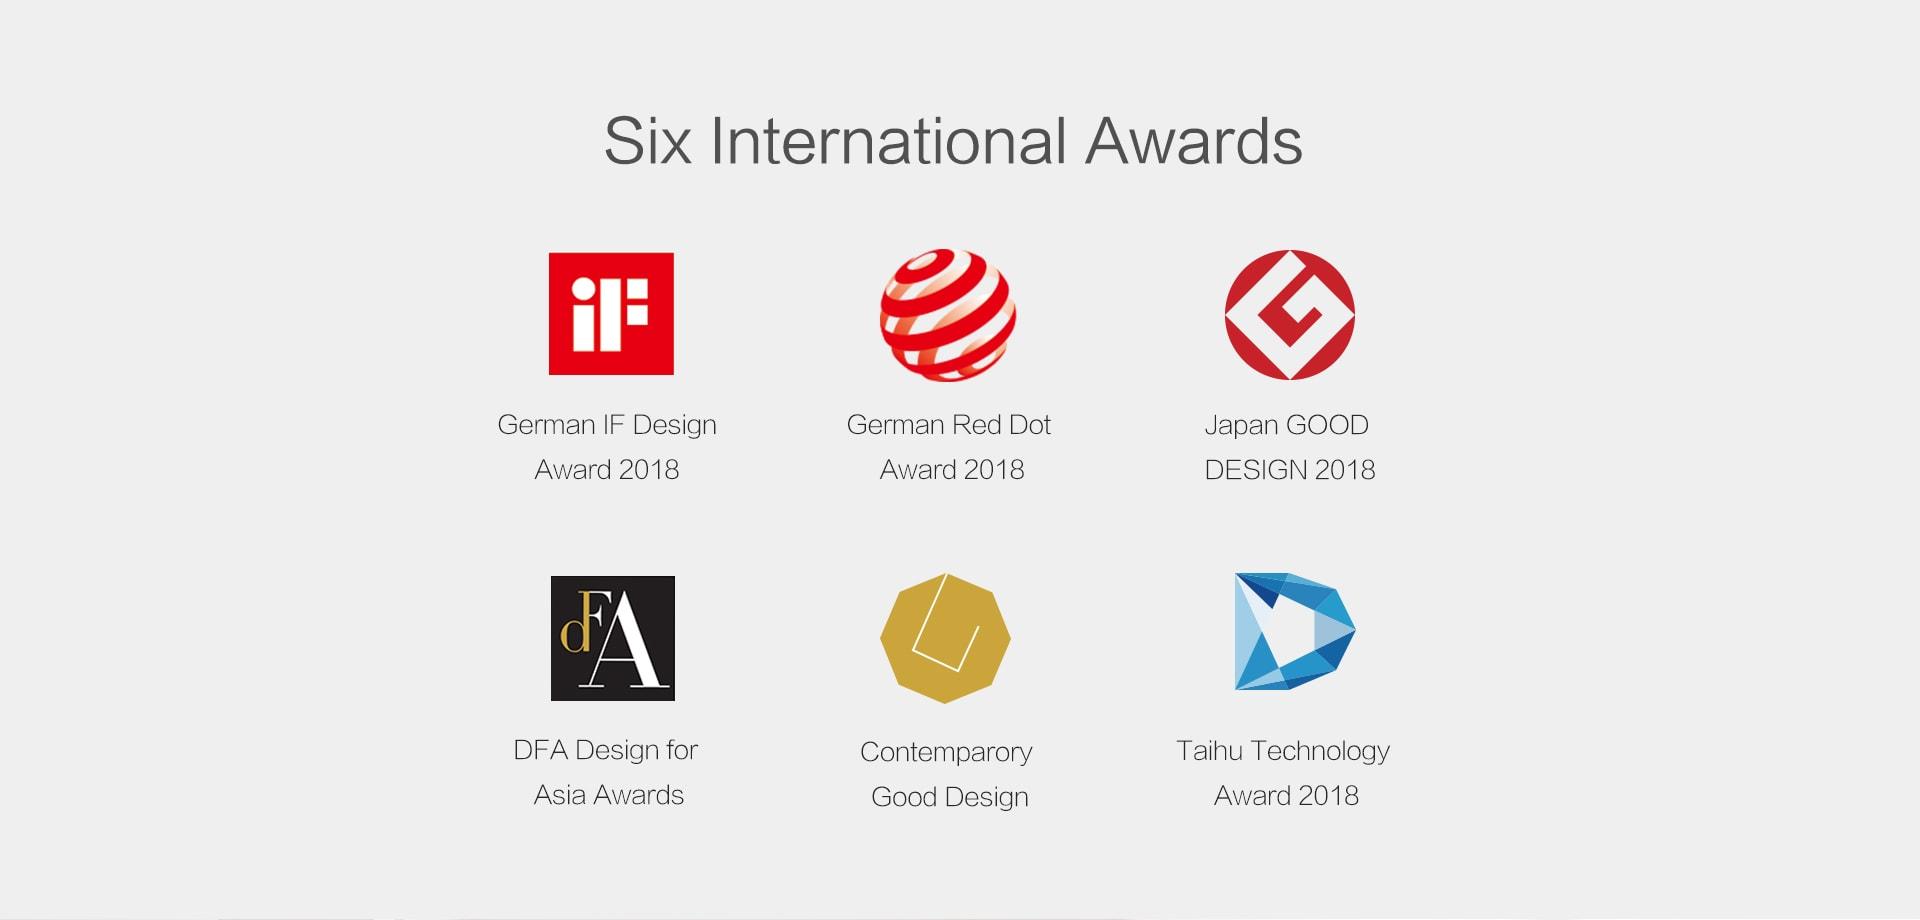 Xiaomi Roidmi S1 Special 4